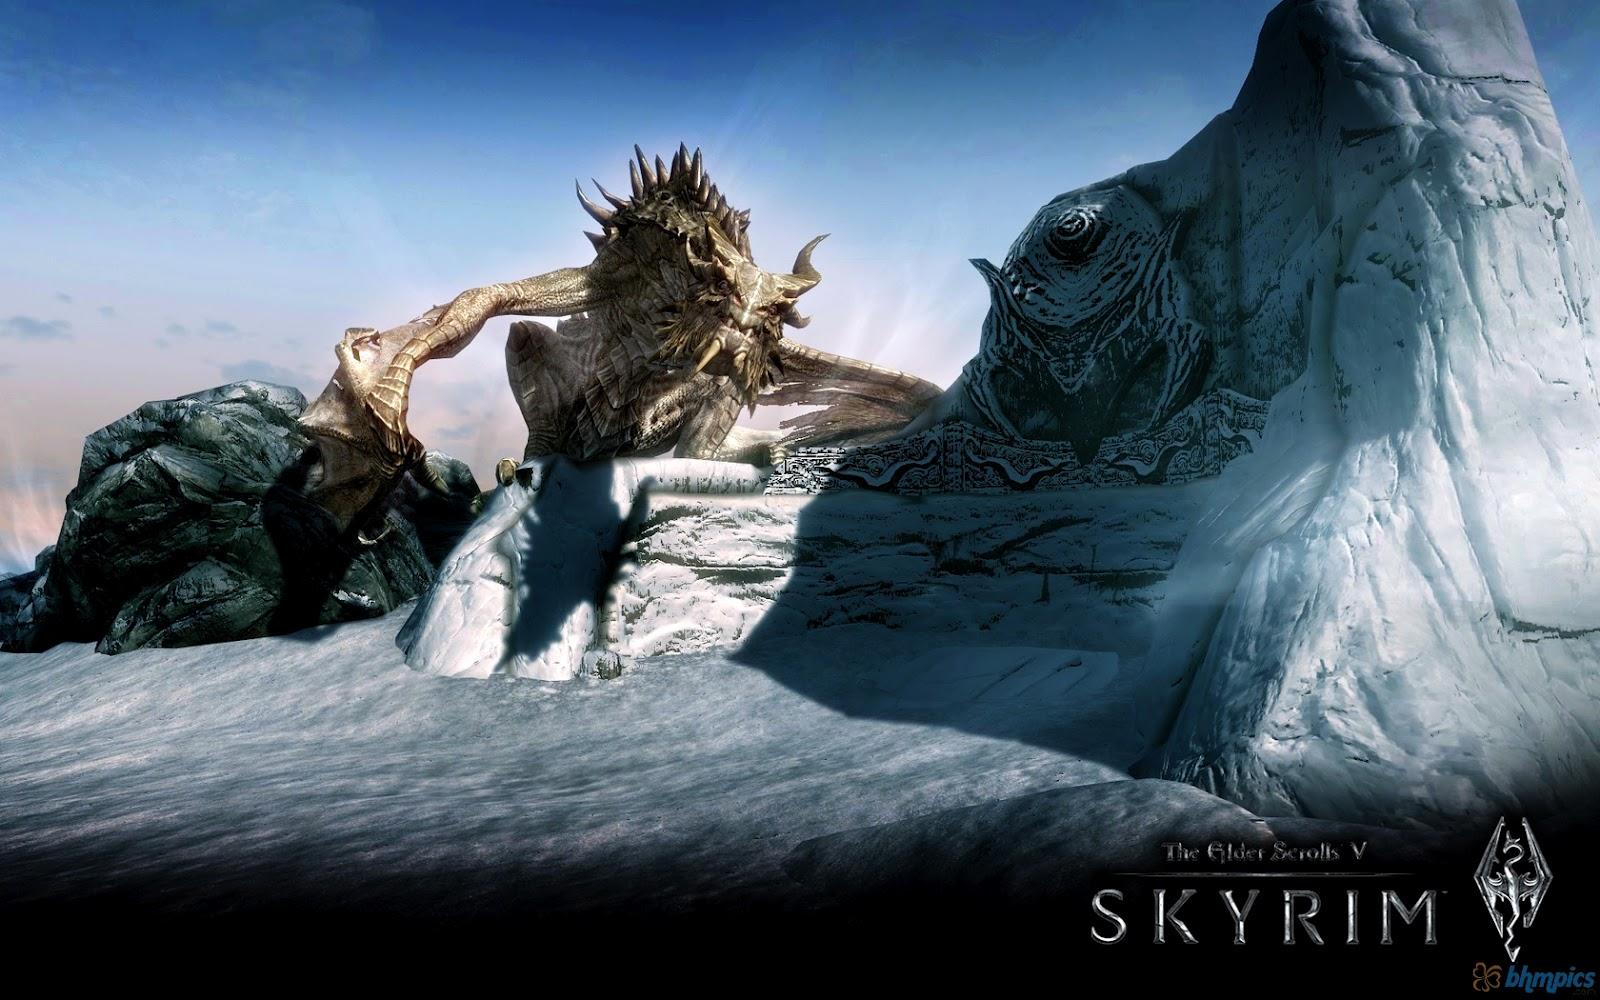 http://4.bp.blogspot.com/-M981eTwHl5c/UFa_Pf5lMuI/AAAAAAAAEBI/-AeYkkh2CYQ/s1600/tes_v_skyrim_game-1680x1050.jpg